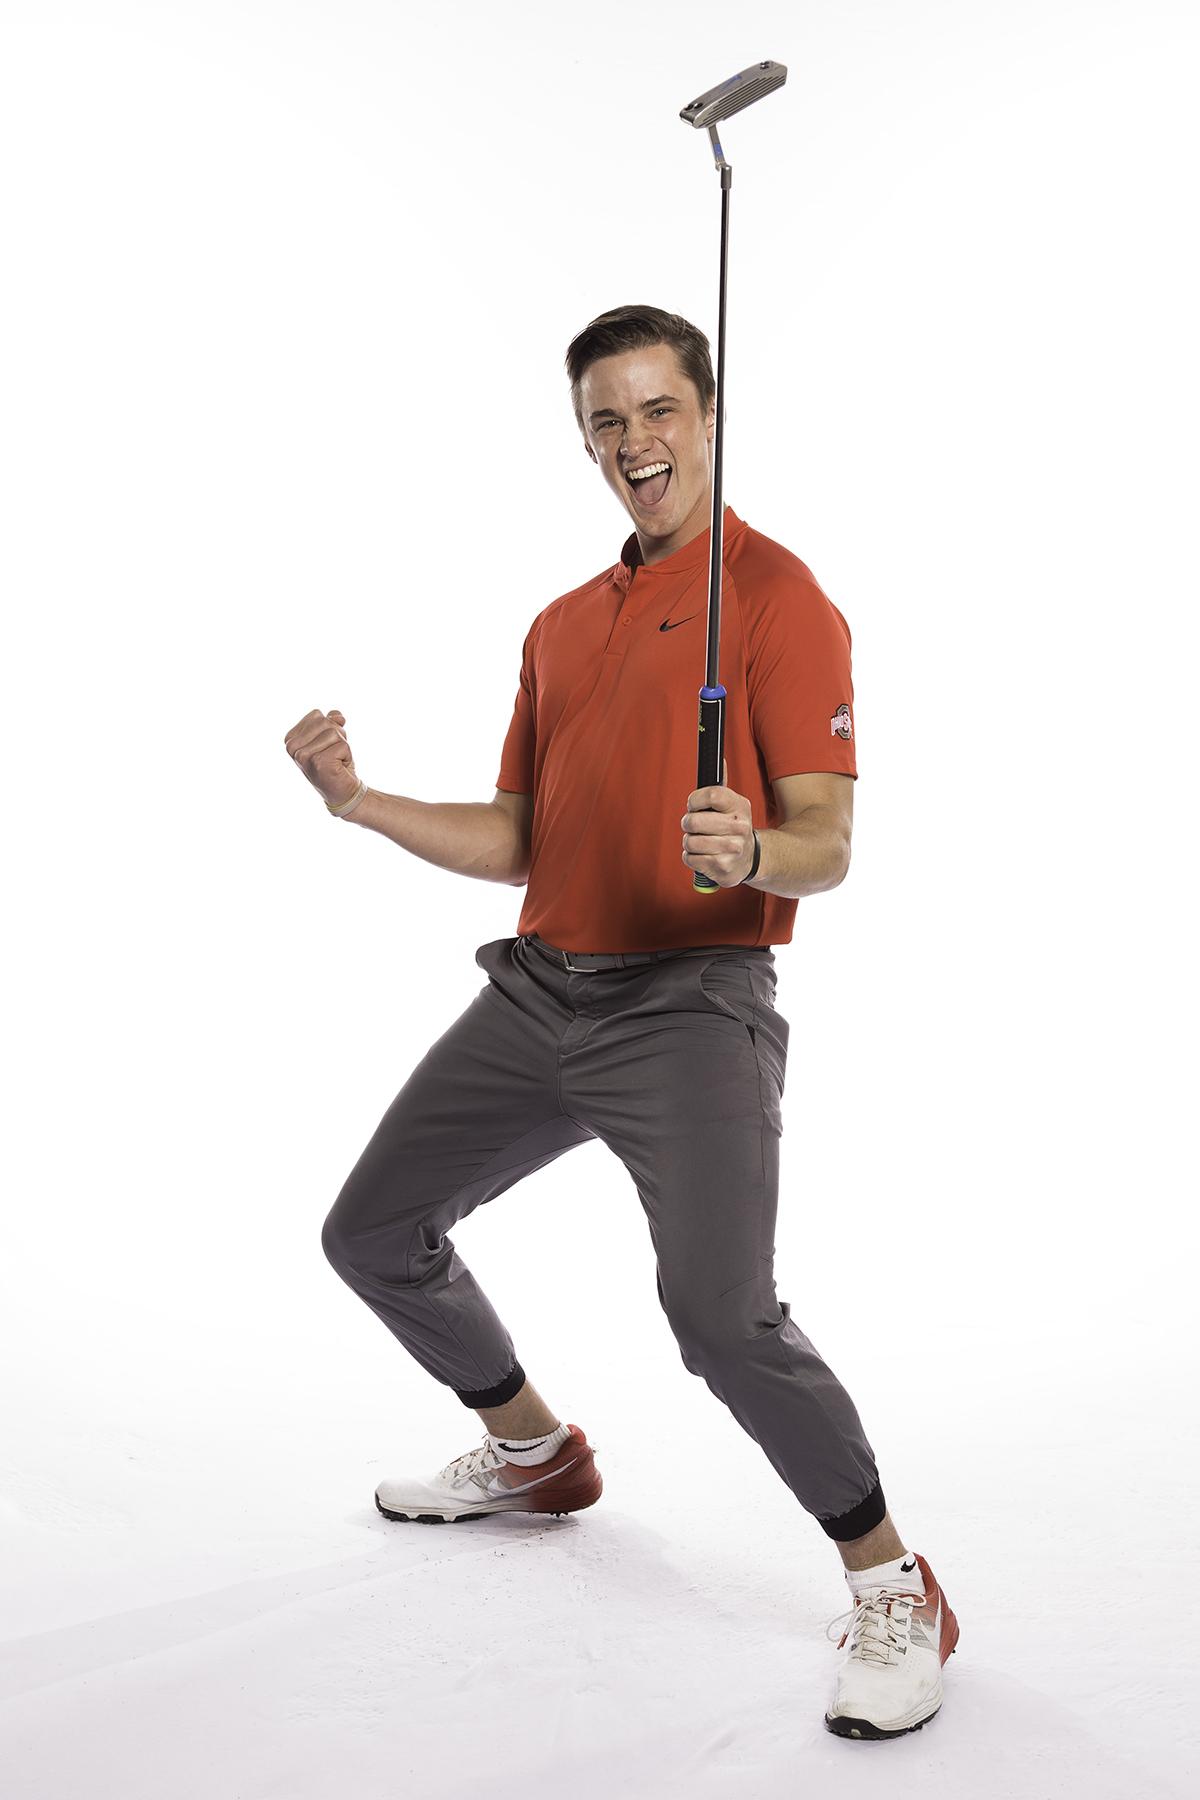 020618-Golf Portraits-148.jpg